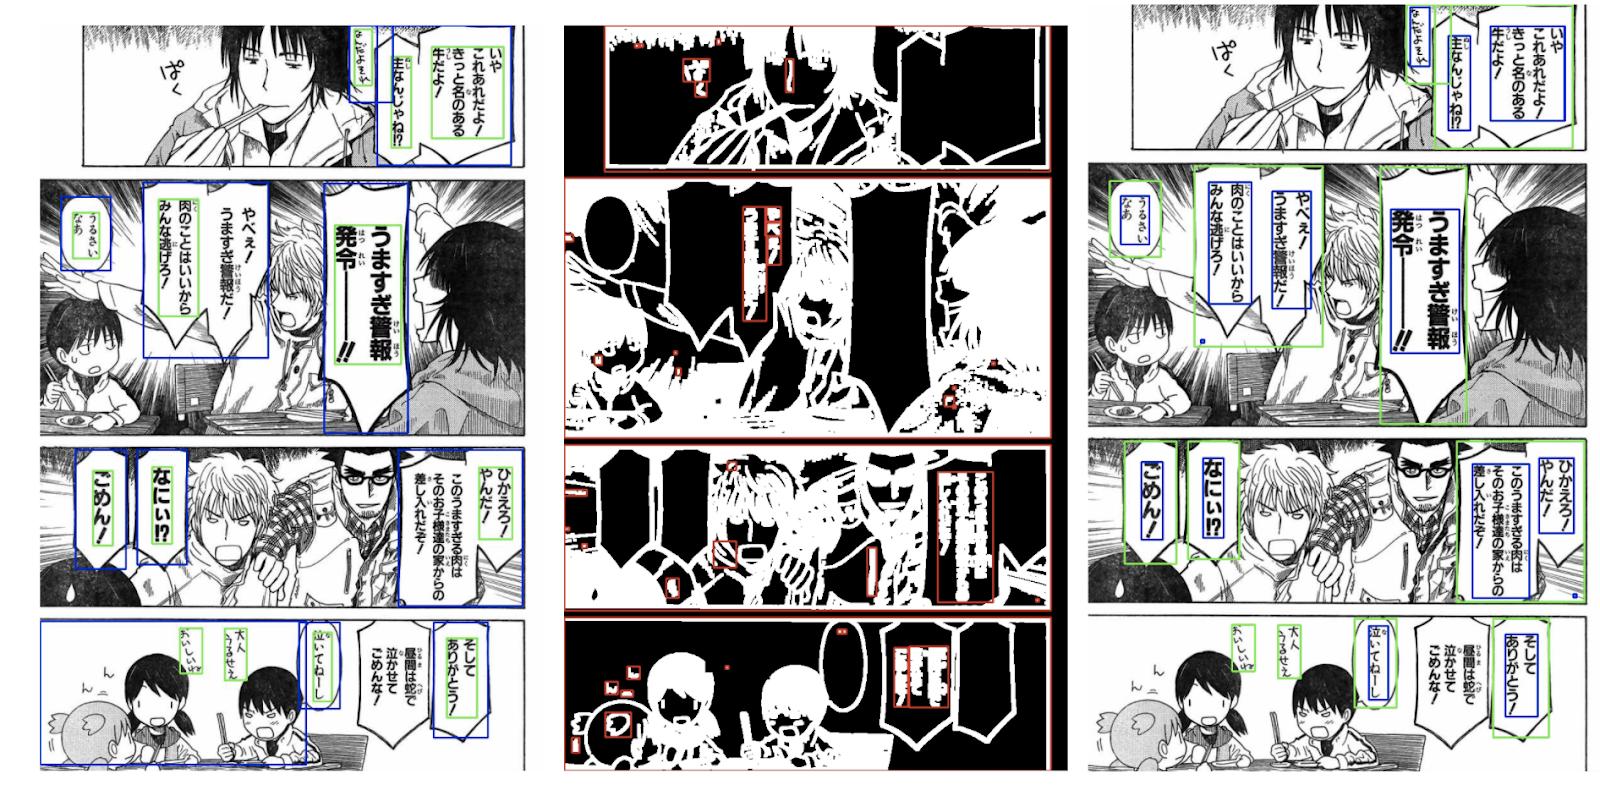 automated manga translation detecting text bubbles